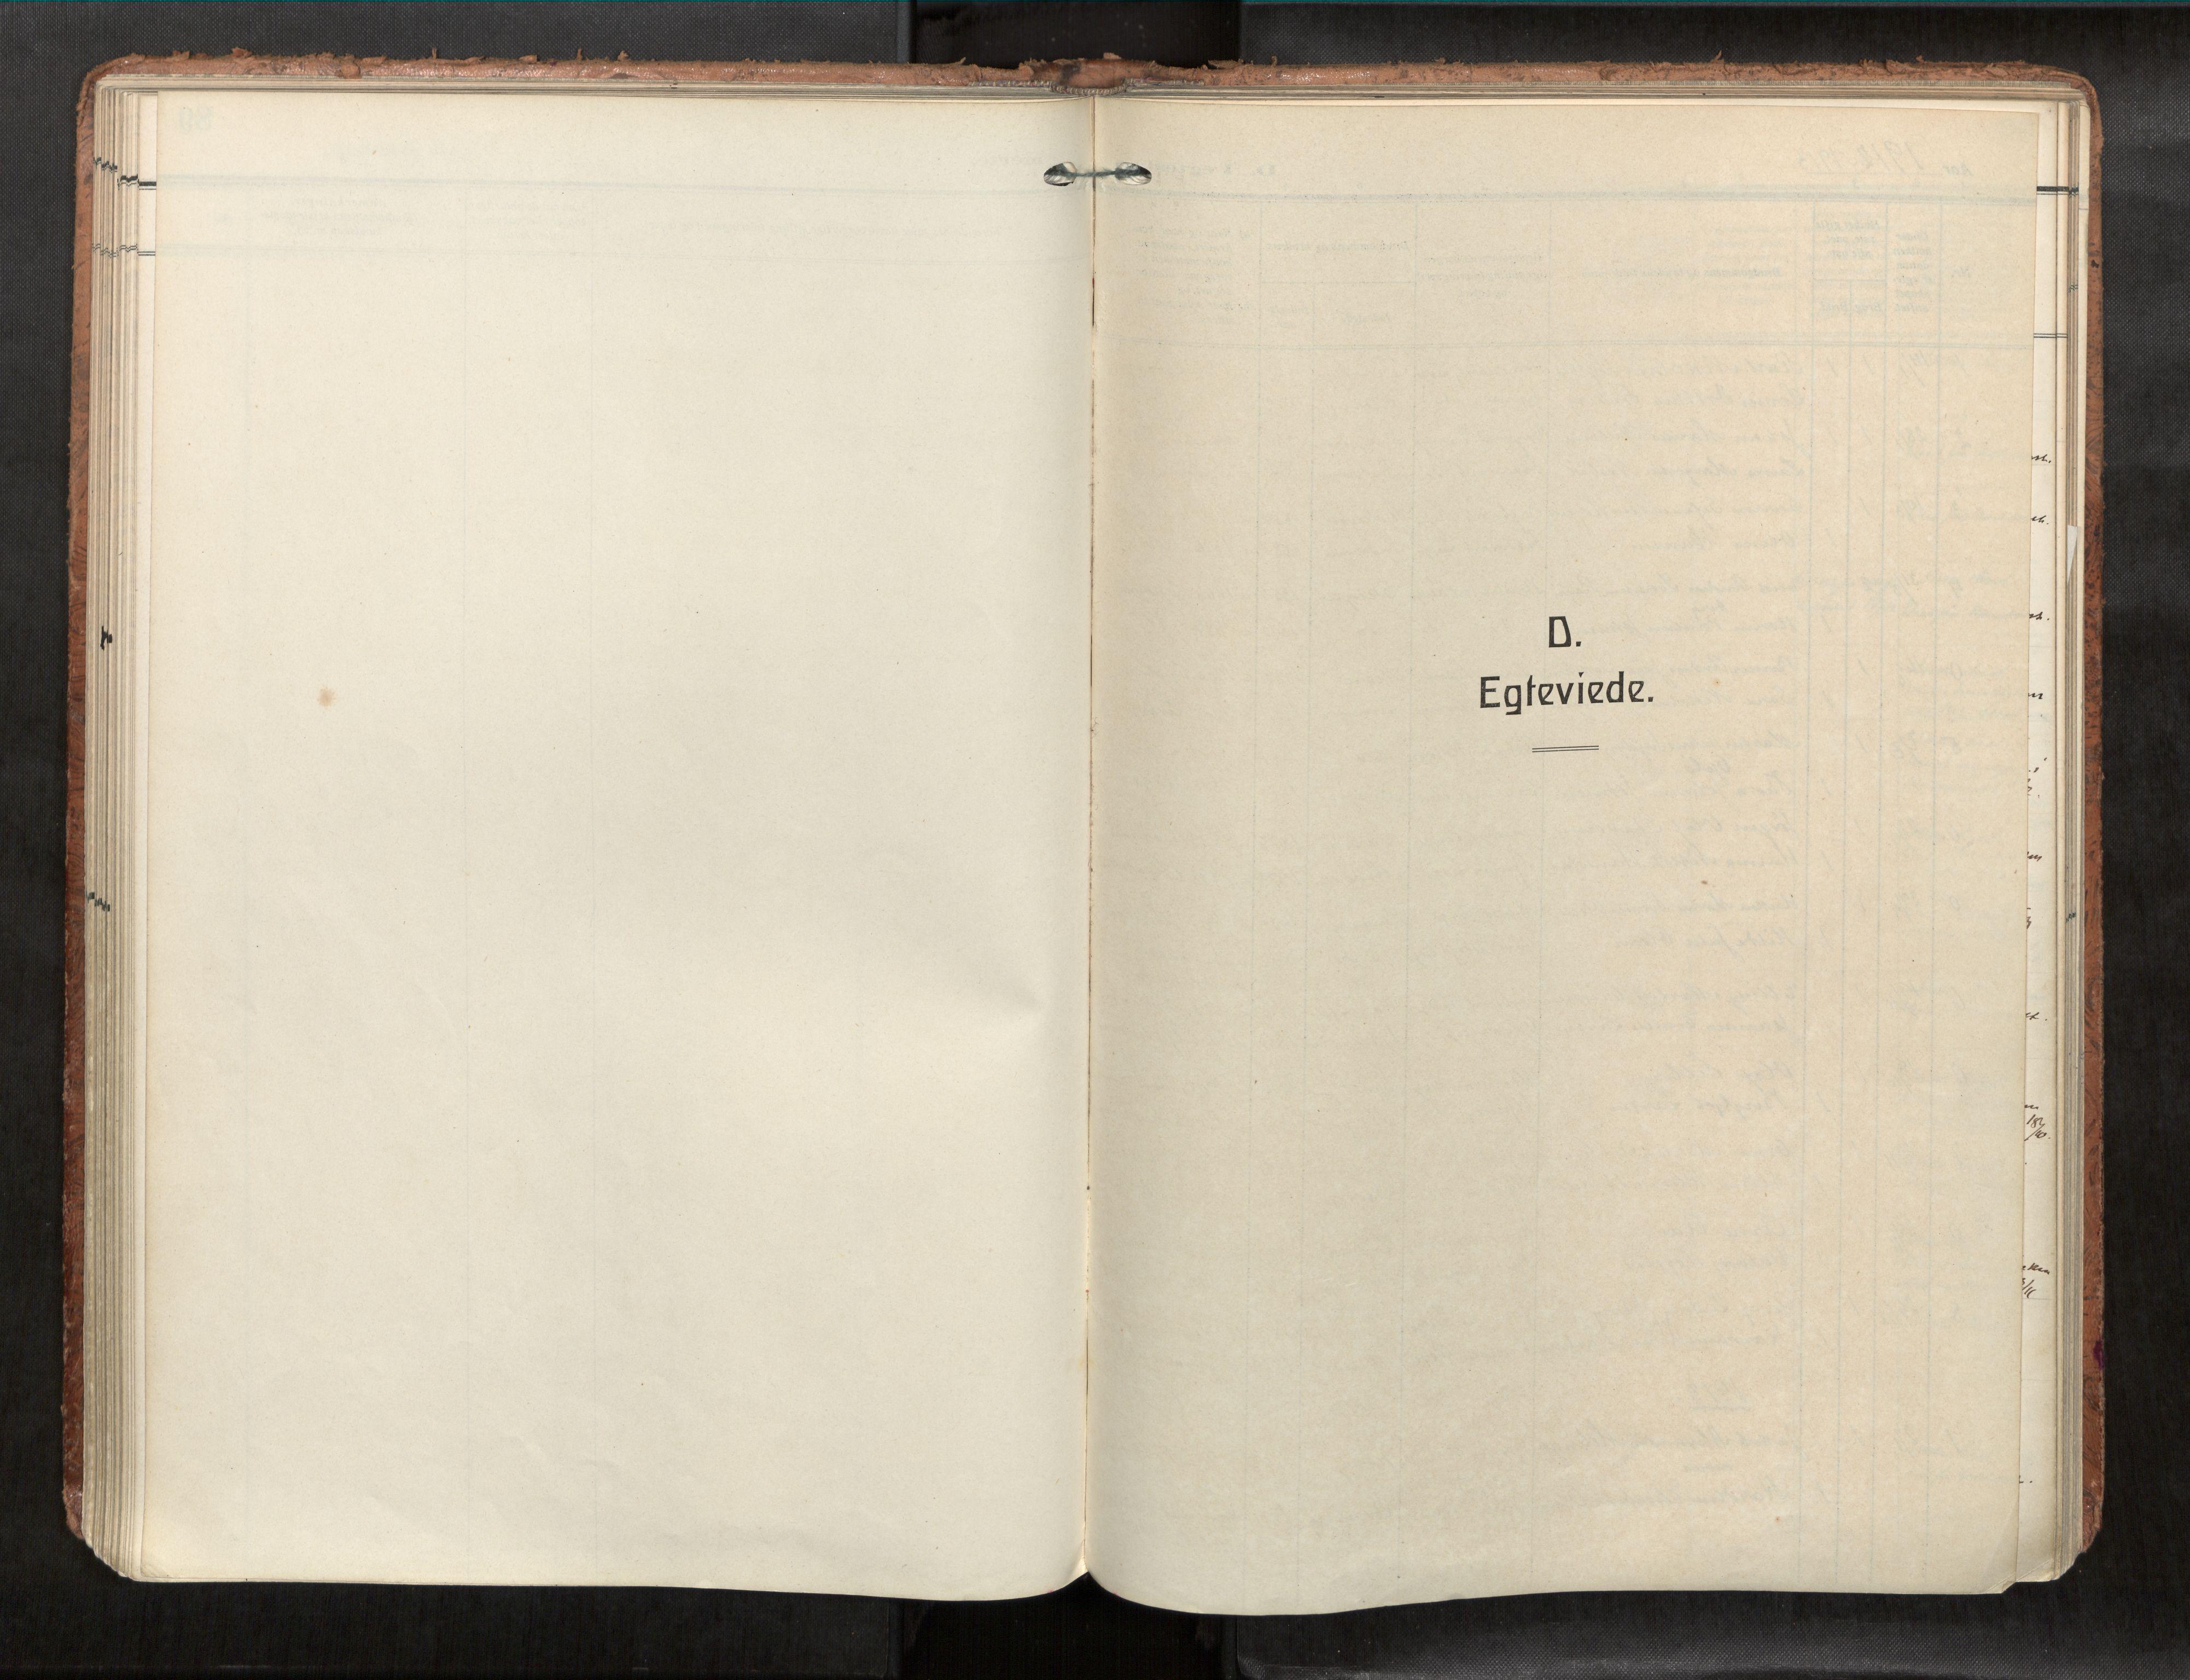 SAT, Levanger sokneprestkontor*, Parish register (official) no. 1, 1912-1932